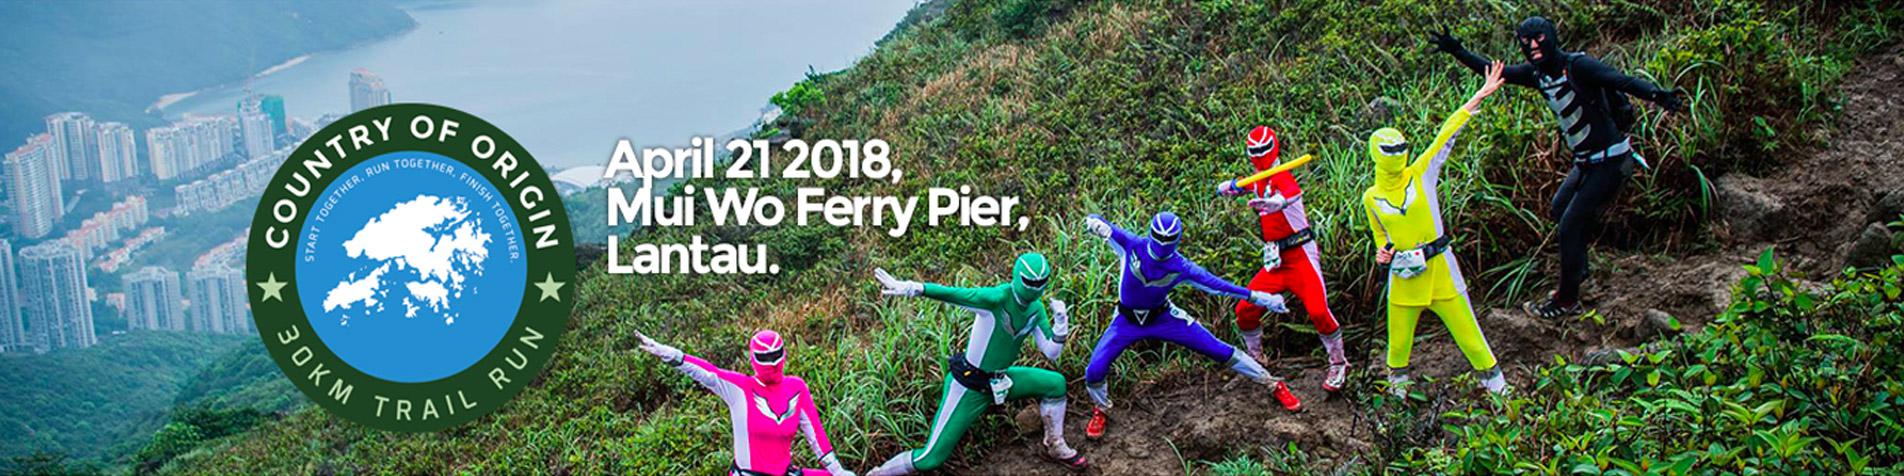 Country of Origin Trail Run 2018